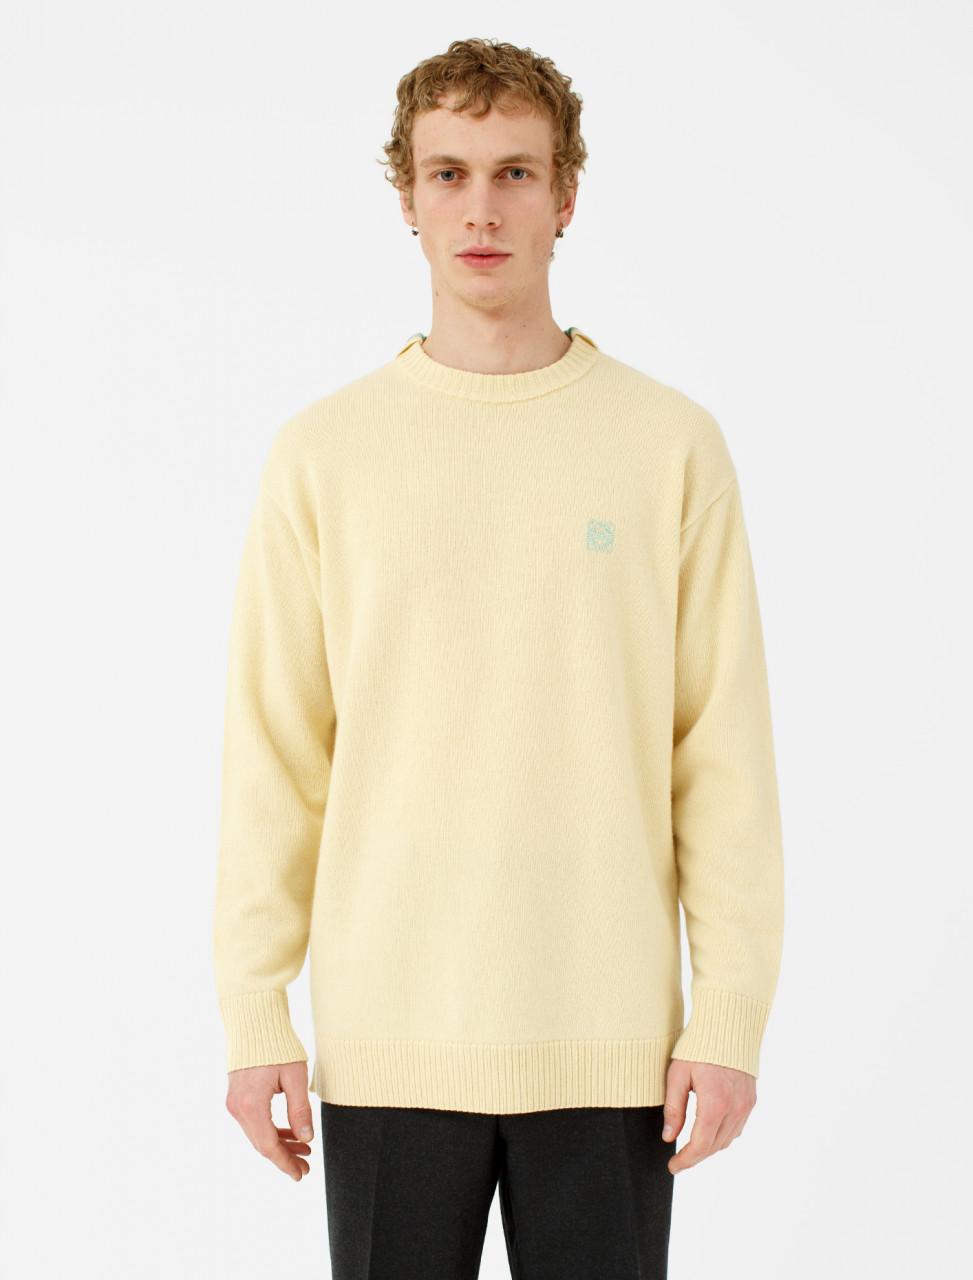 Anagram Sweater in Light Yellow